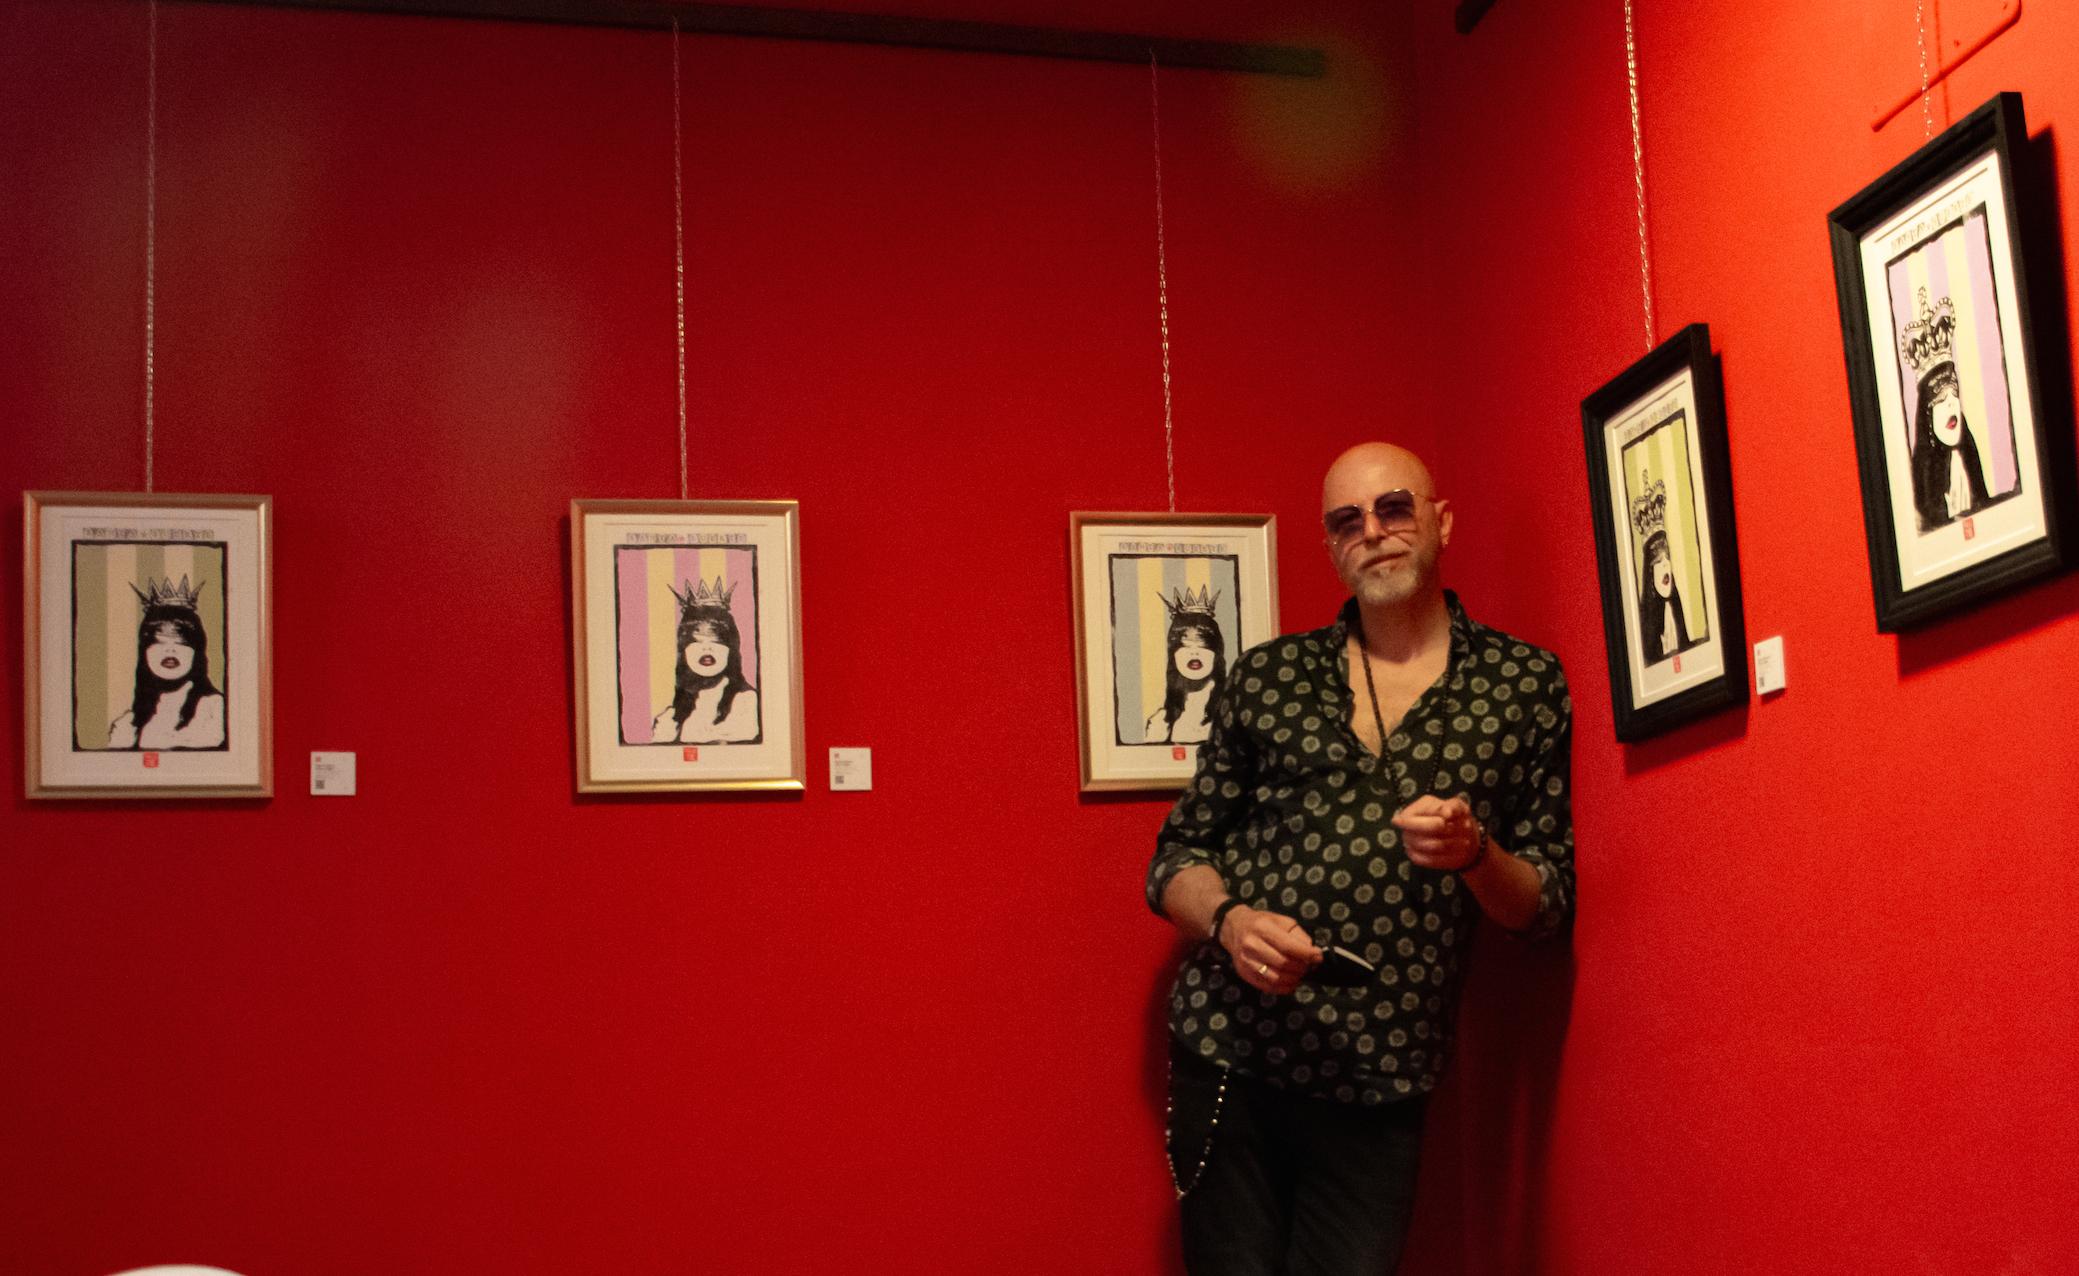 When arts meet Rock 'n roll. A Cremona la prima mostra di Pau dei Negrita